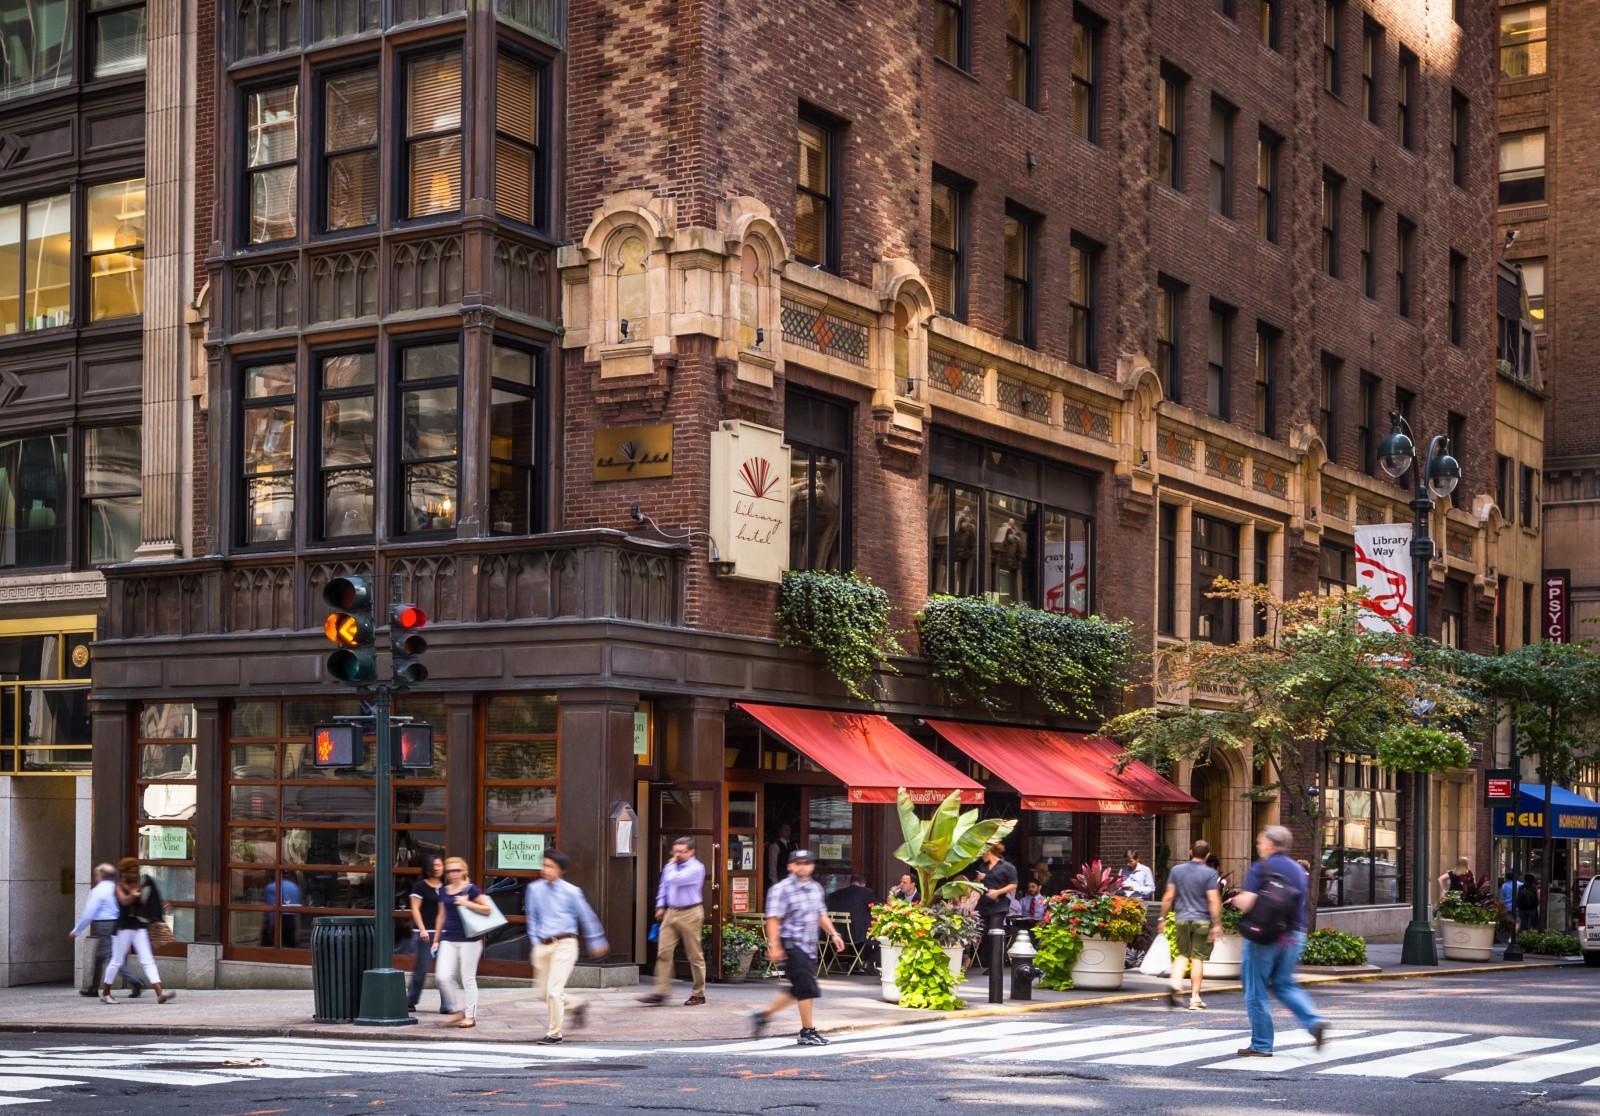 Library Hotel New York City - Exterior